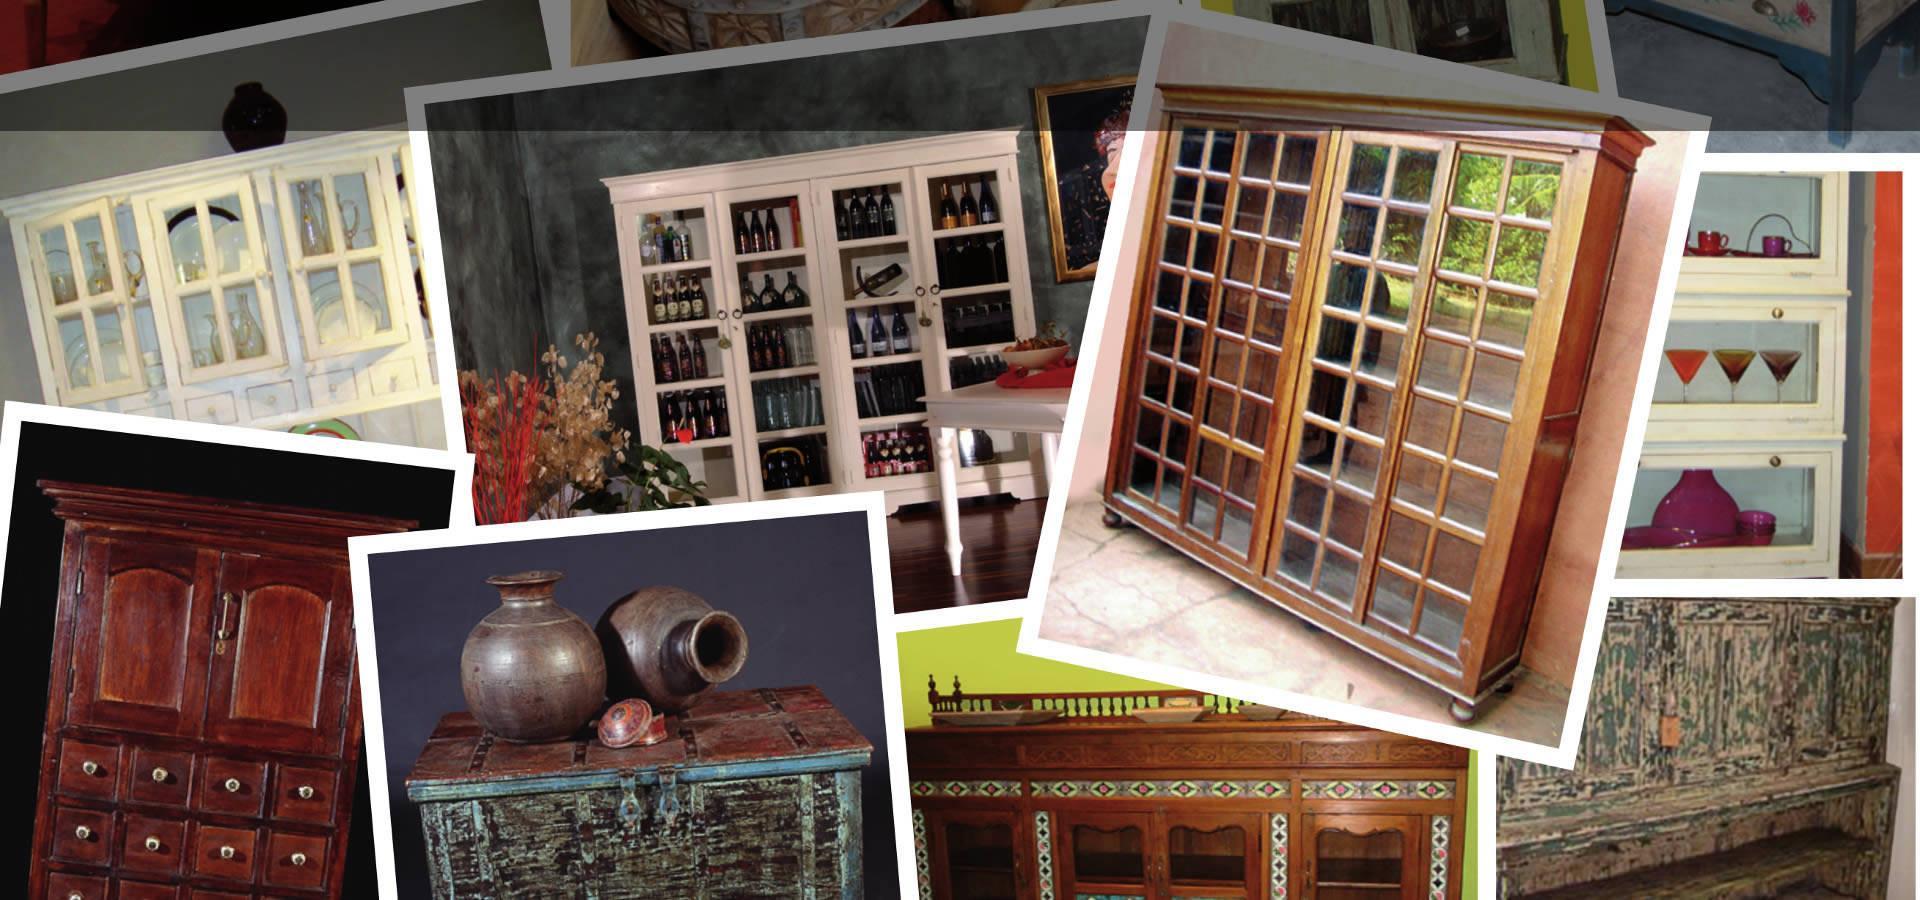 mobili coloniali arredamento shabby chic|etnico|on-line - orissa - Arredamento Shabby Chic Milano